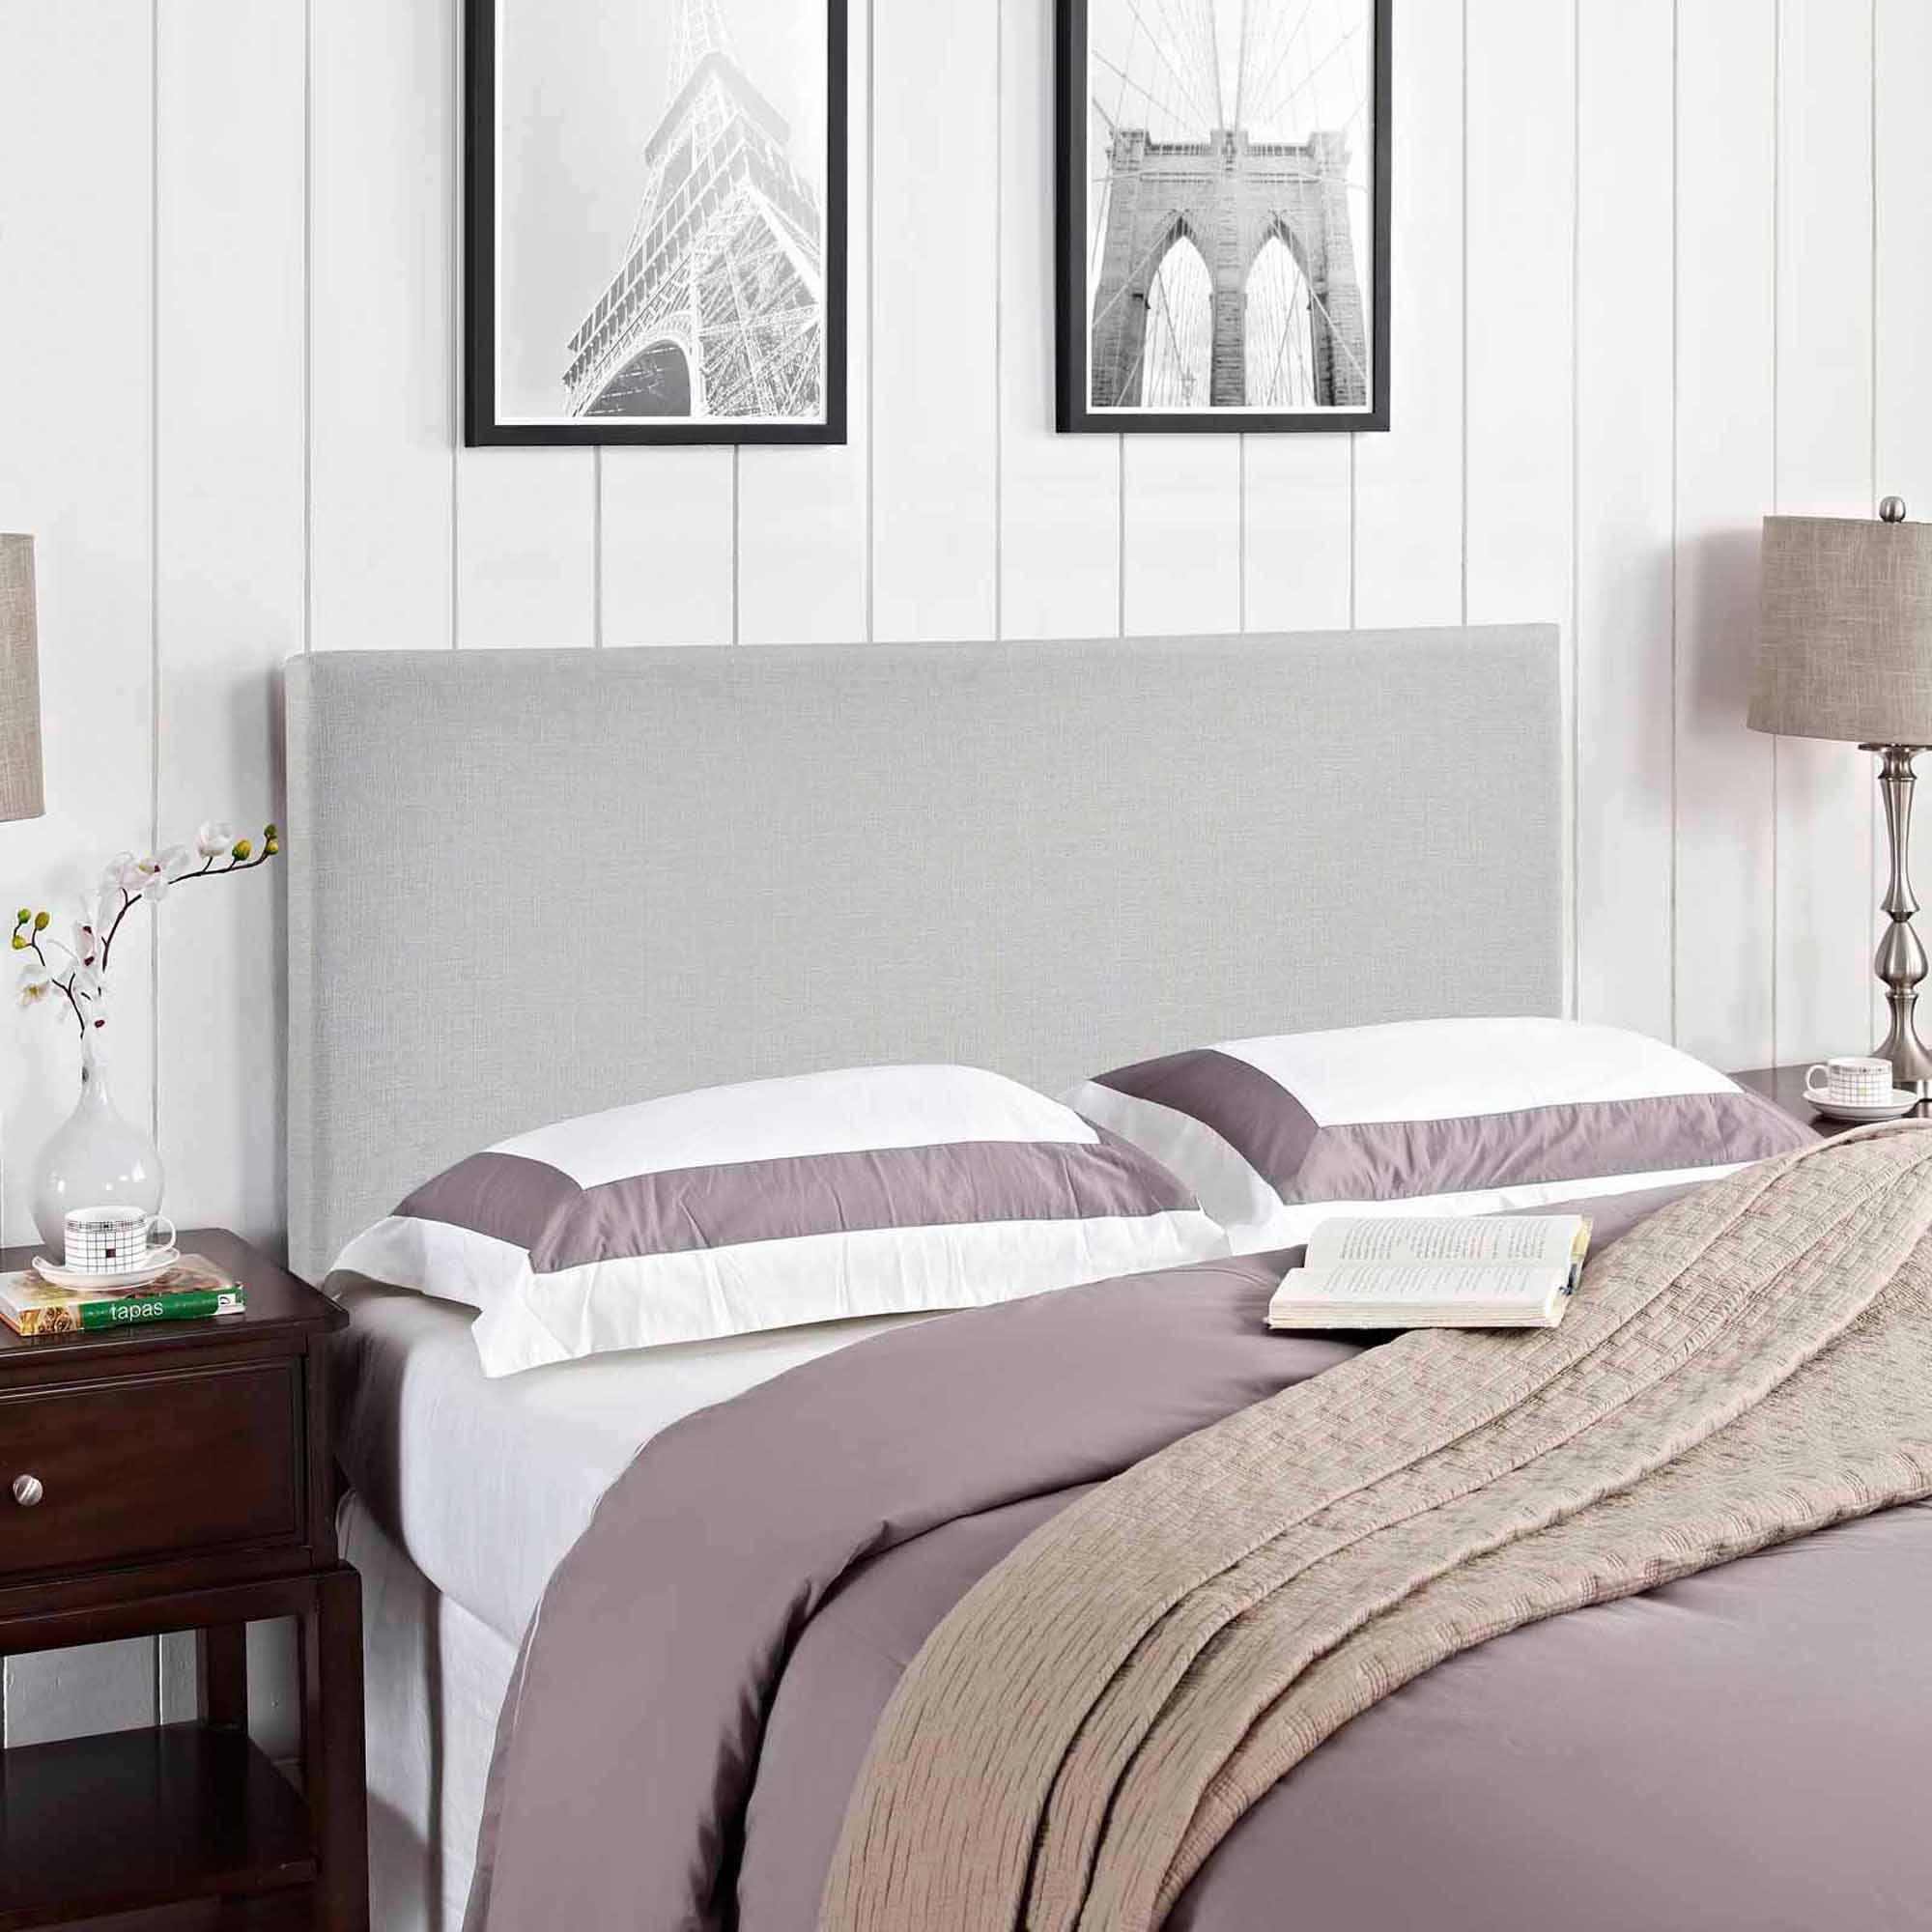 modway region queen upholstered headboard multiple colors  - modway region queen upholstered headboard multiple colors  walmartcom